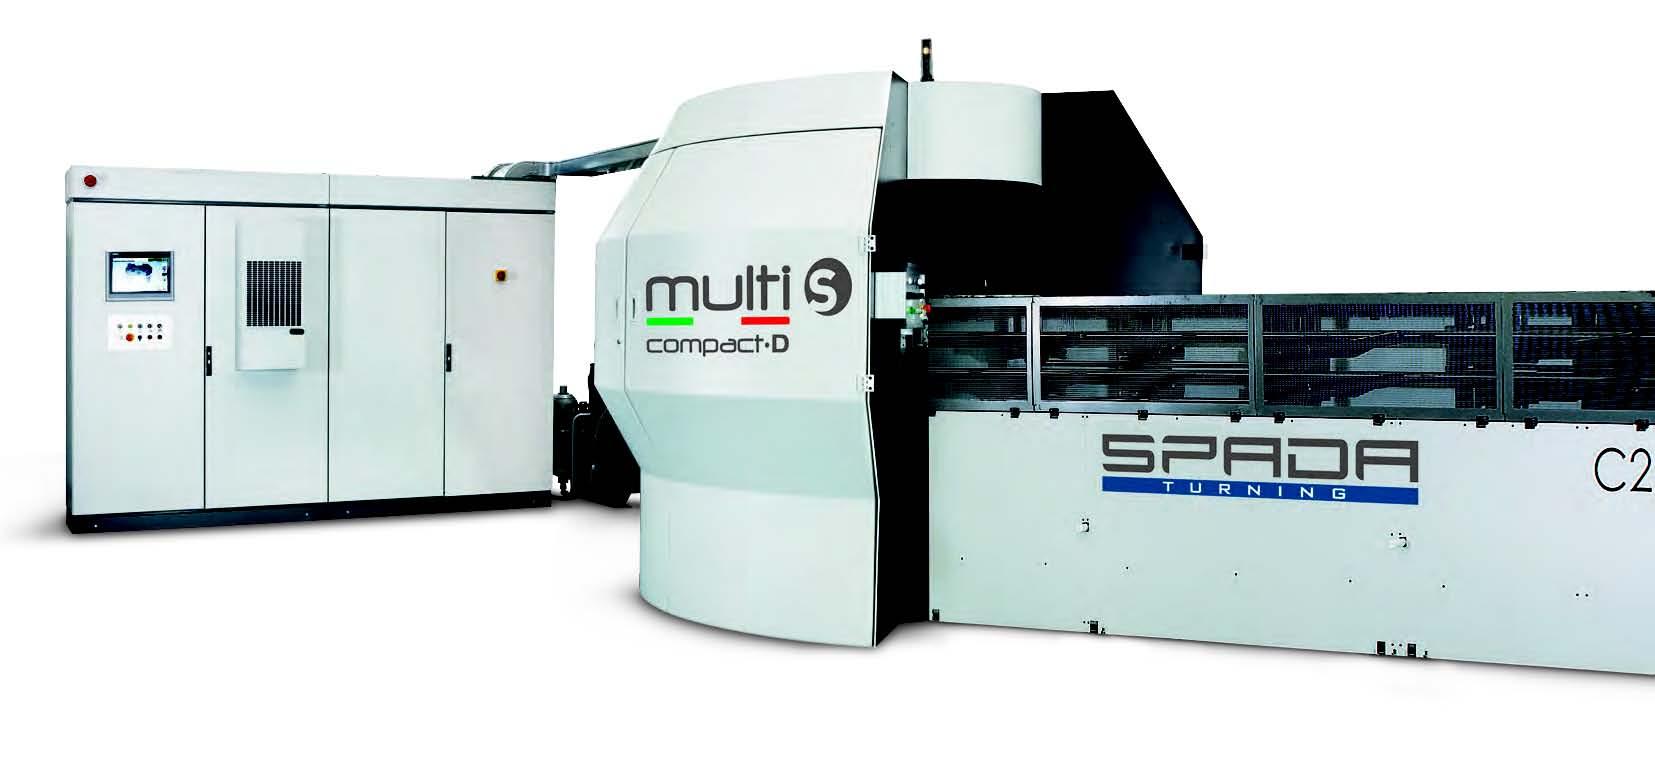 MultiS compactD